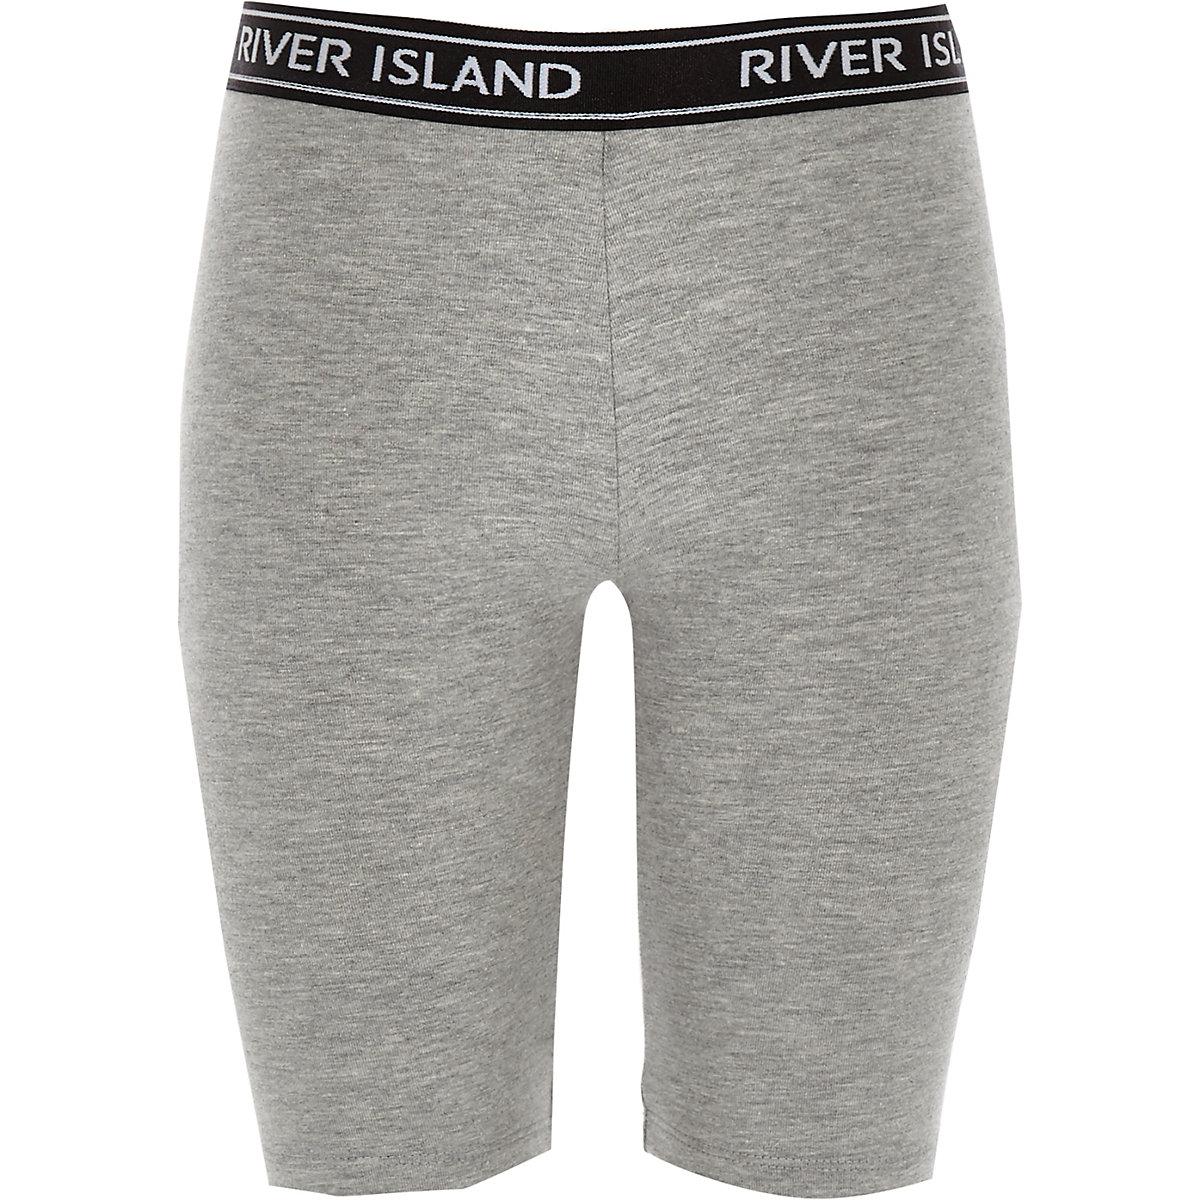 Girls grey marl cycling shorts